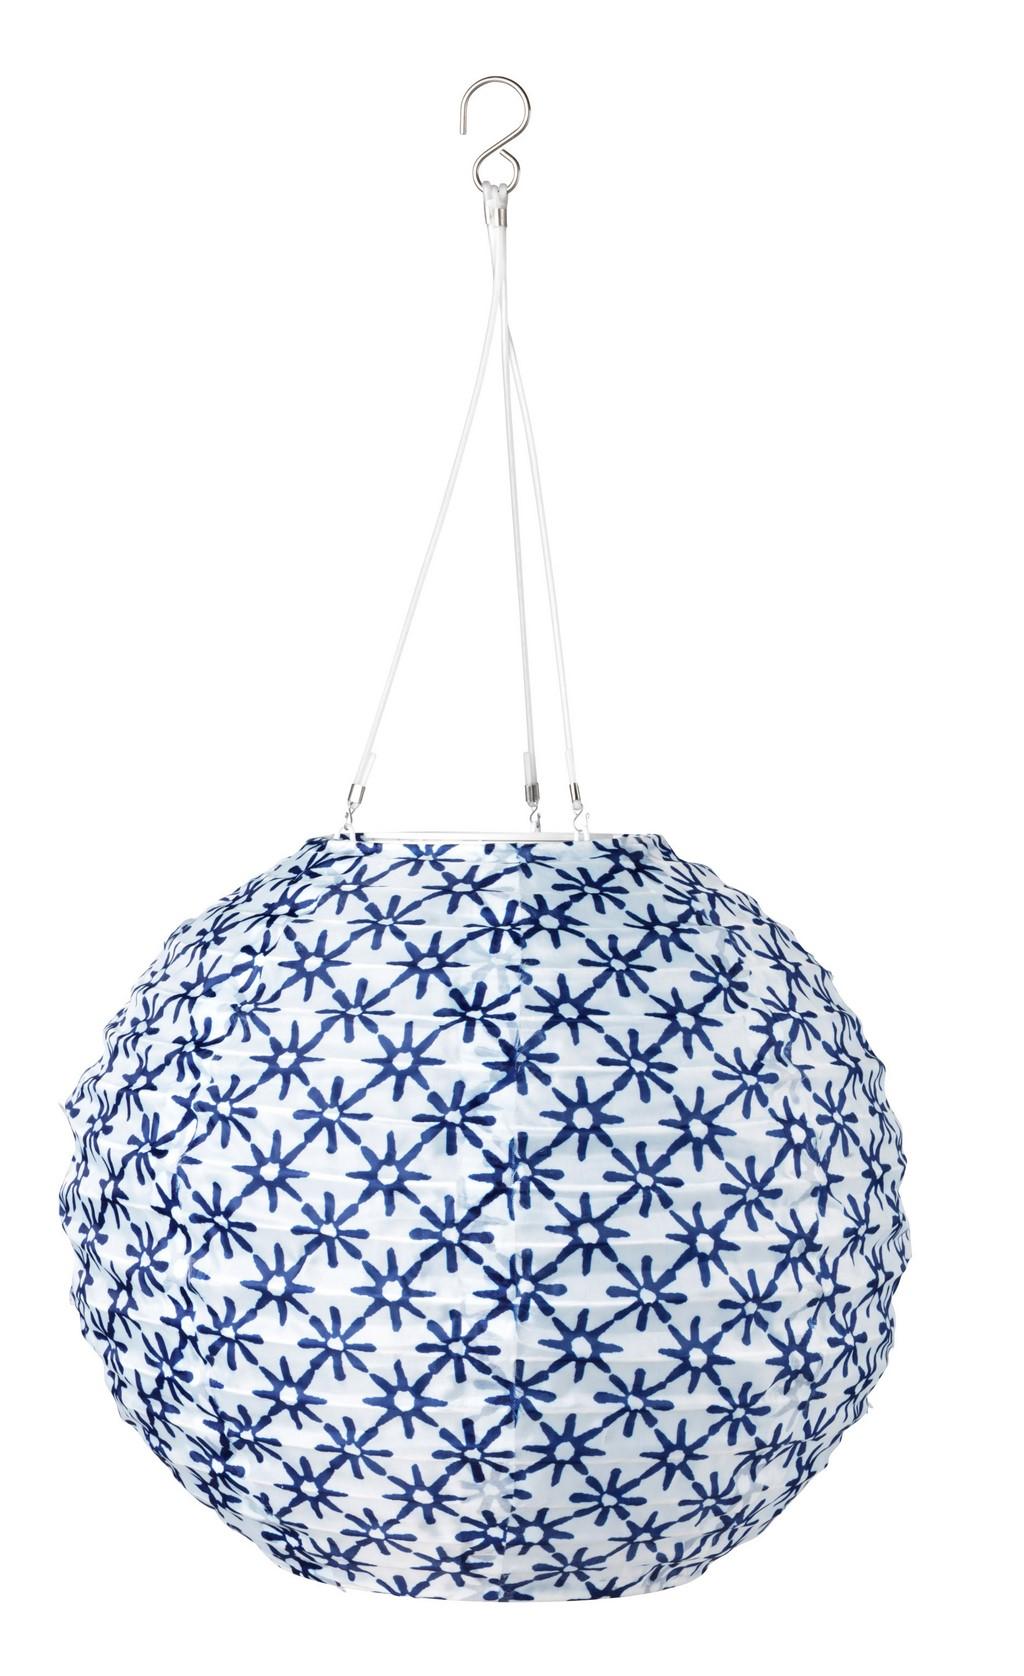 Ikea verano 2016 pe560118 solvinden lampara led energia for Lampara globo ikea